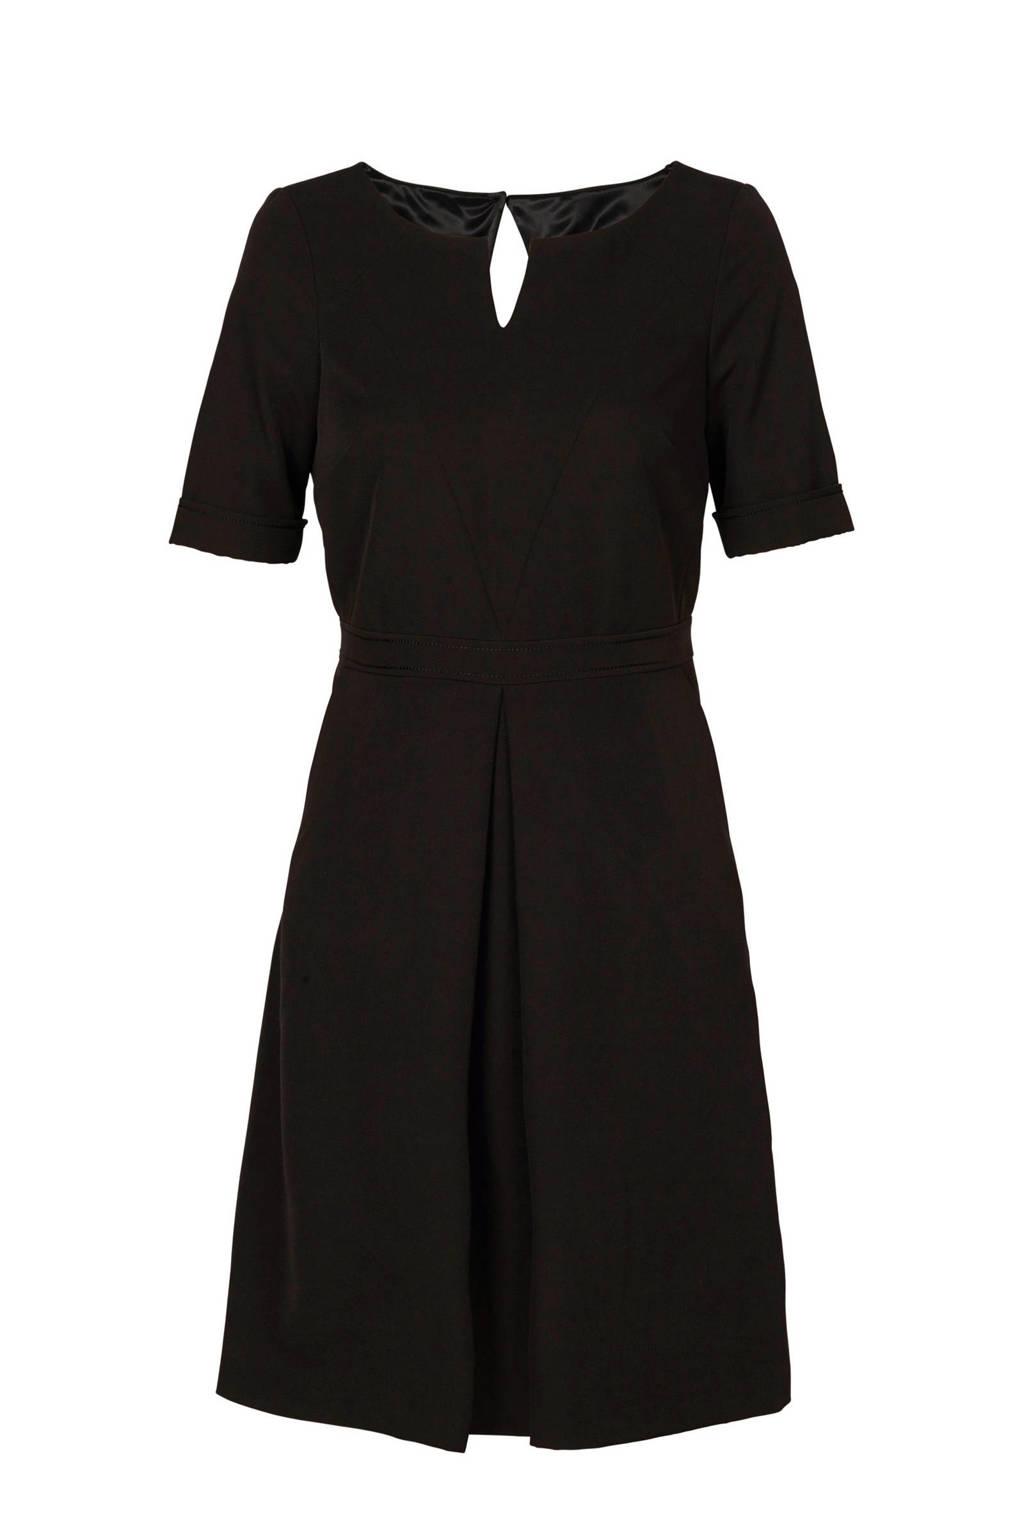 Mart Visser jurk met plooi detail zwart, Zwart